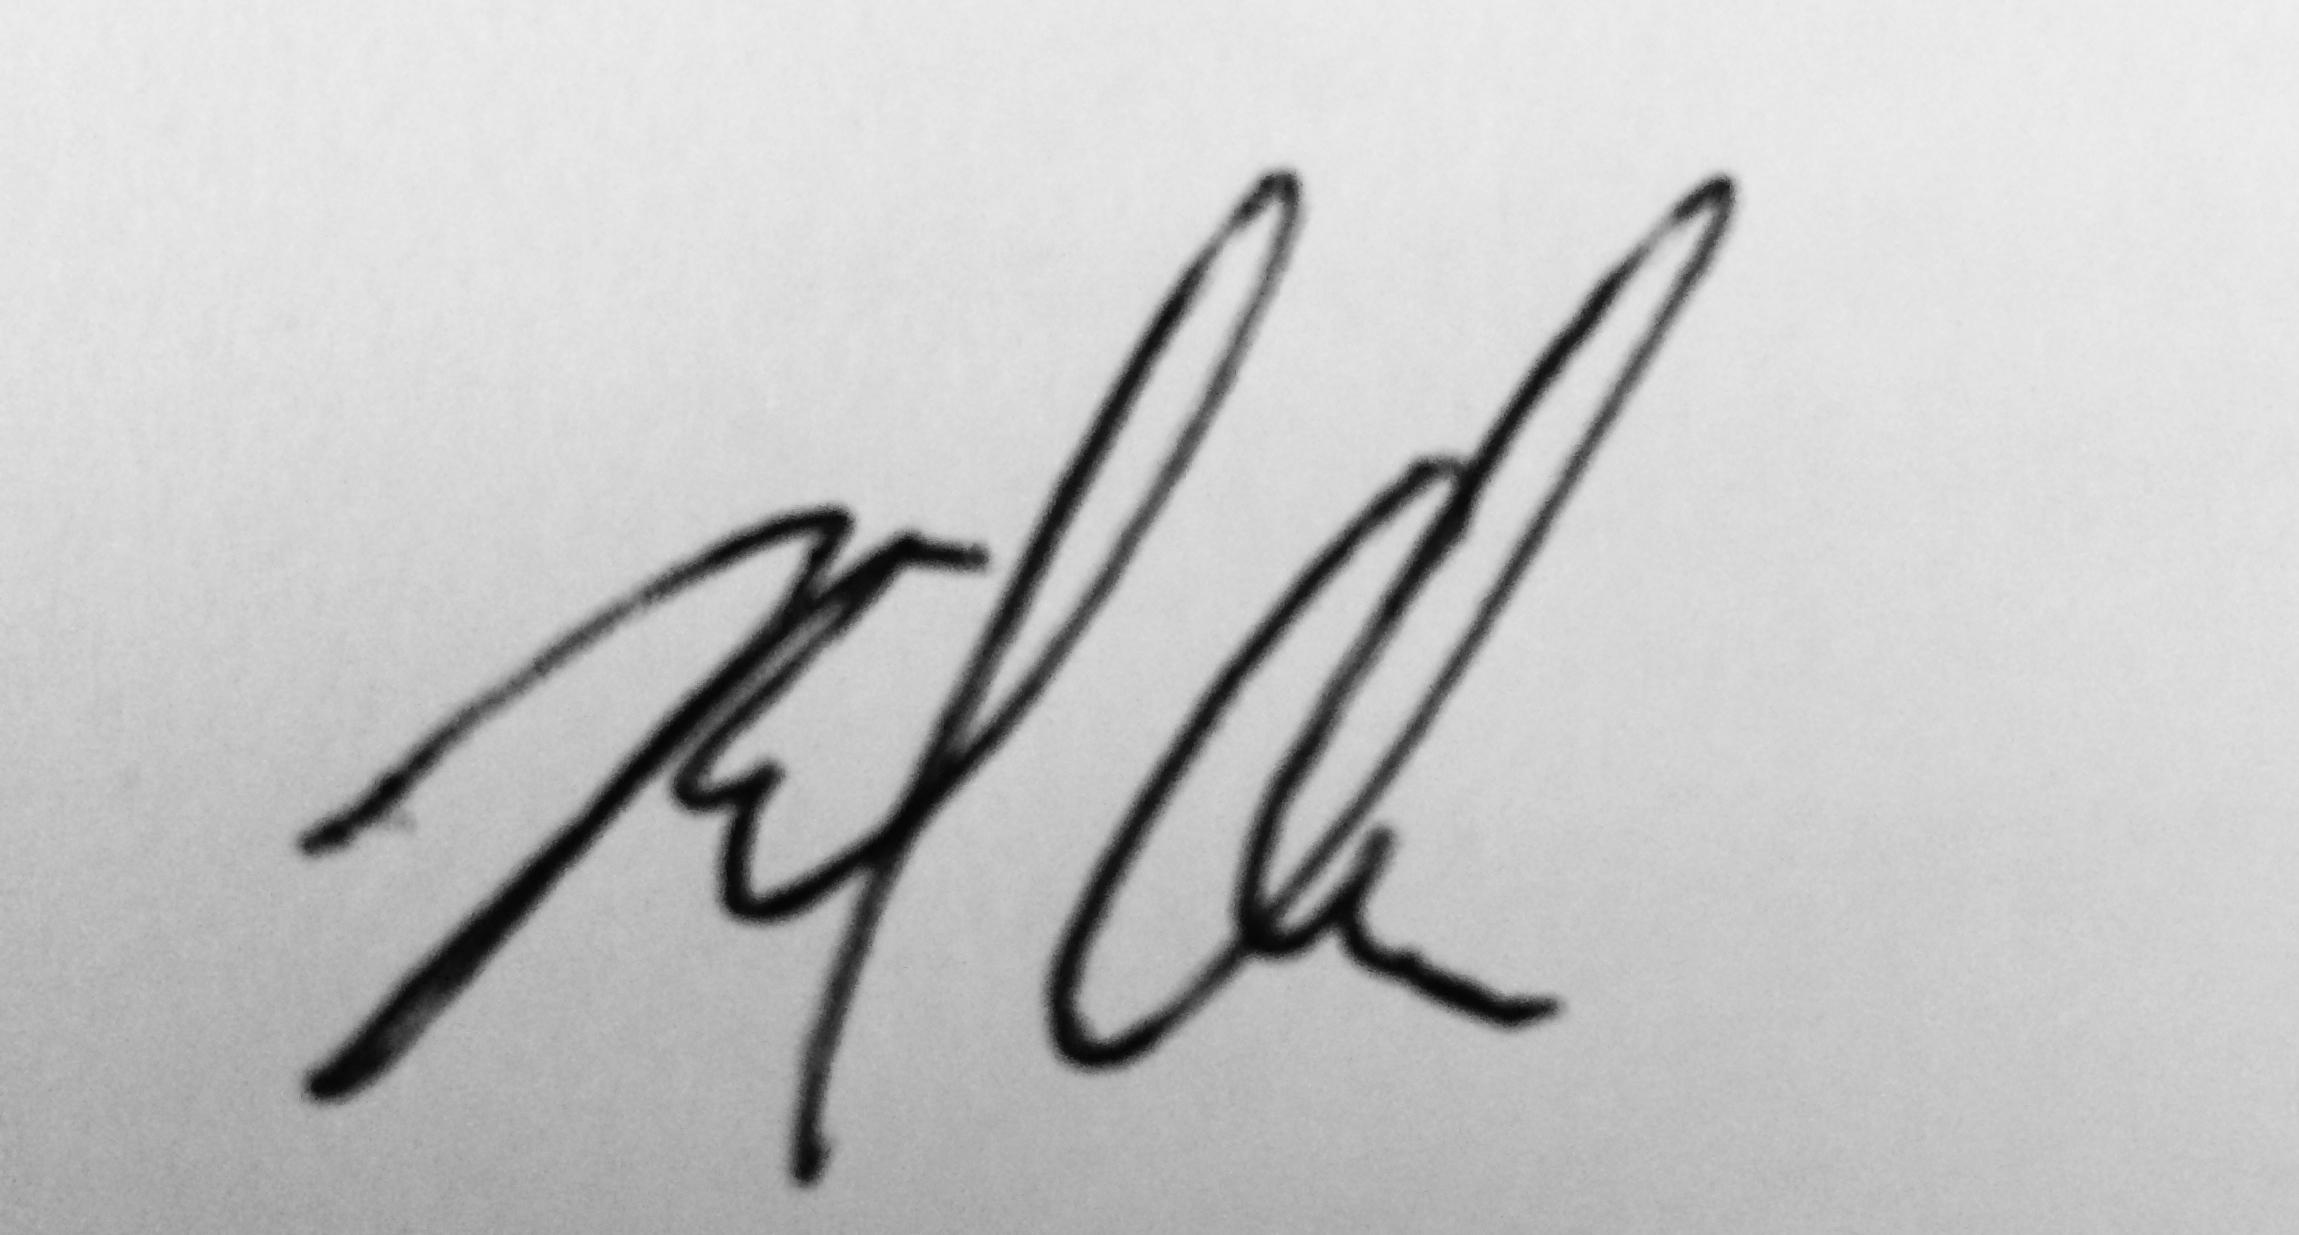 Michael Chabler's Signature